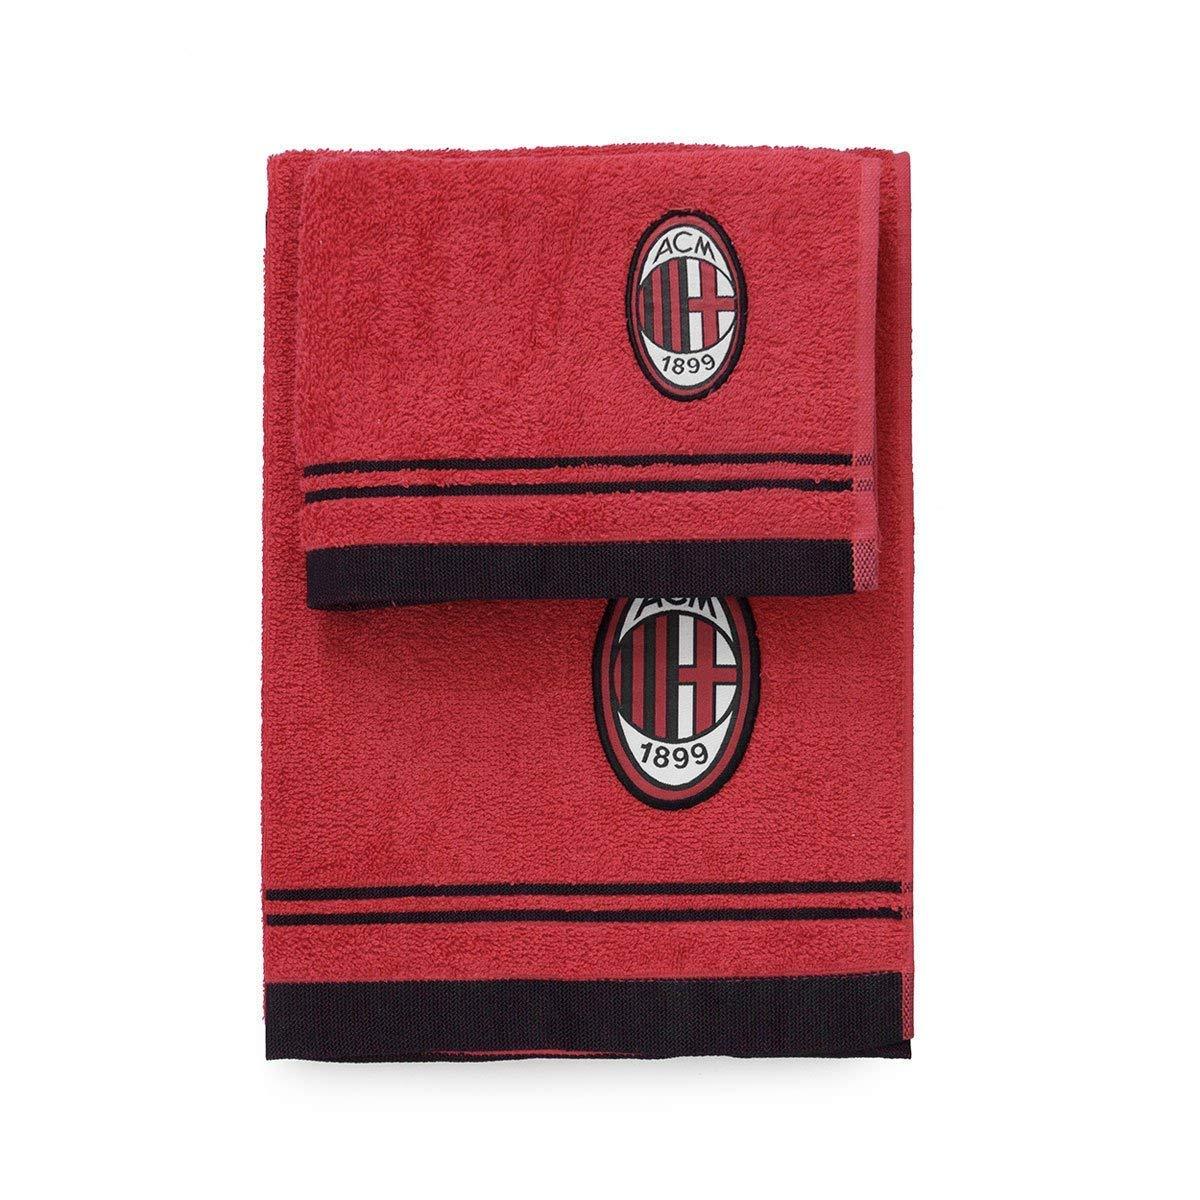 vivi casa Asciugamano A.C Milan con OSPITE Set Bagno 1+1 Spugna 100% Cotone Bianco